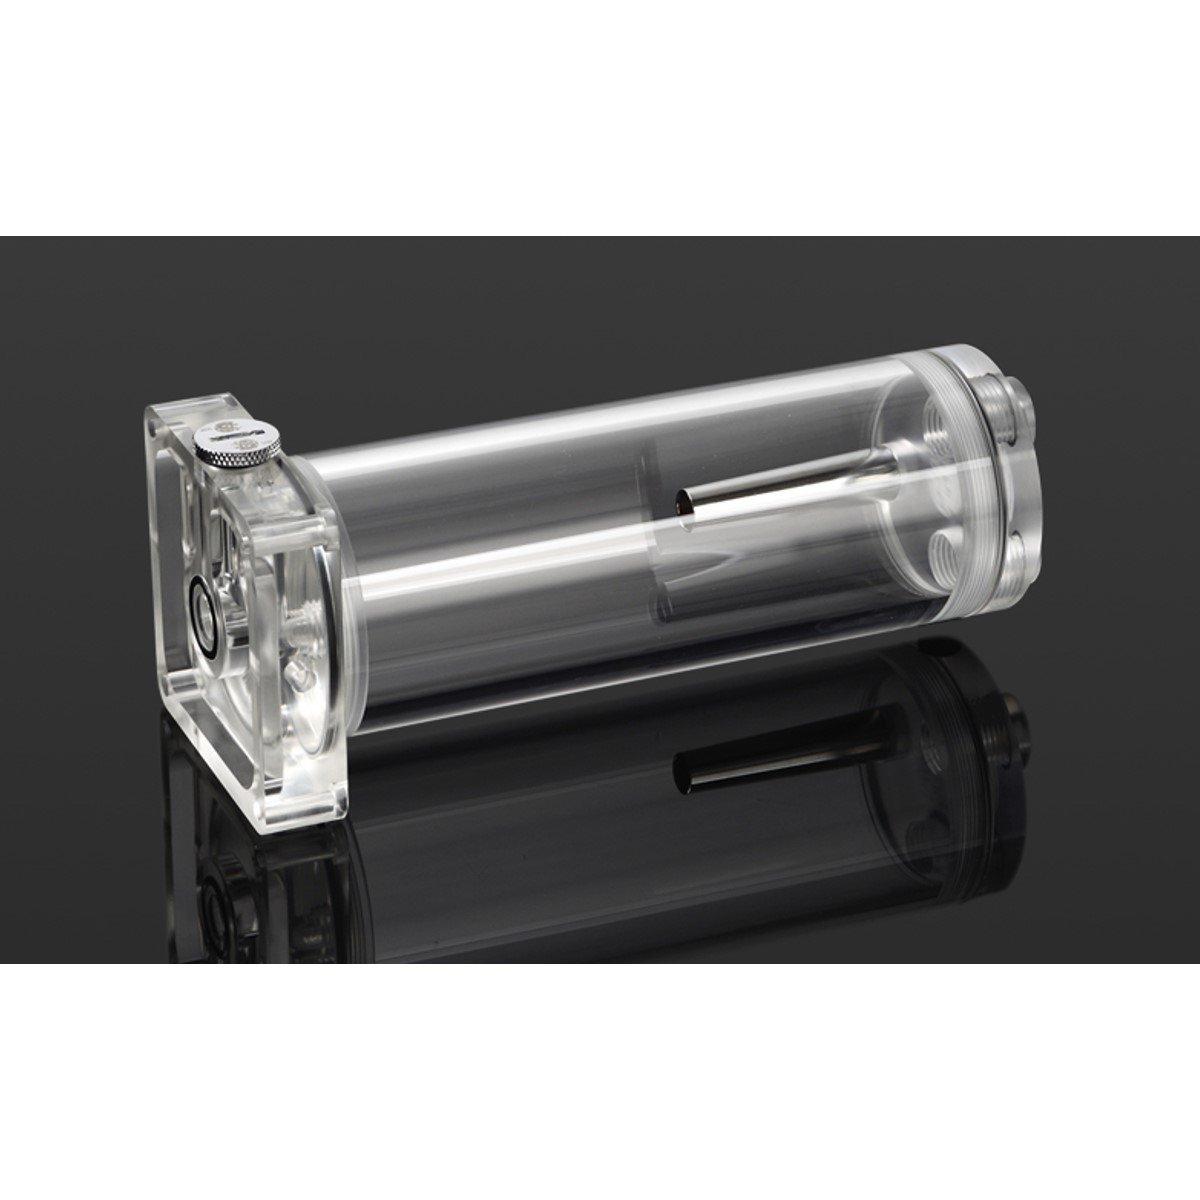 Bits Power Premium Dual/Single D5 Top Upgrade Kit 150 (POM Material) (BP-PD5TOPUK150-CL)